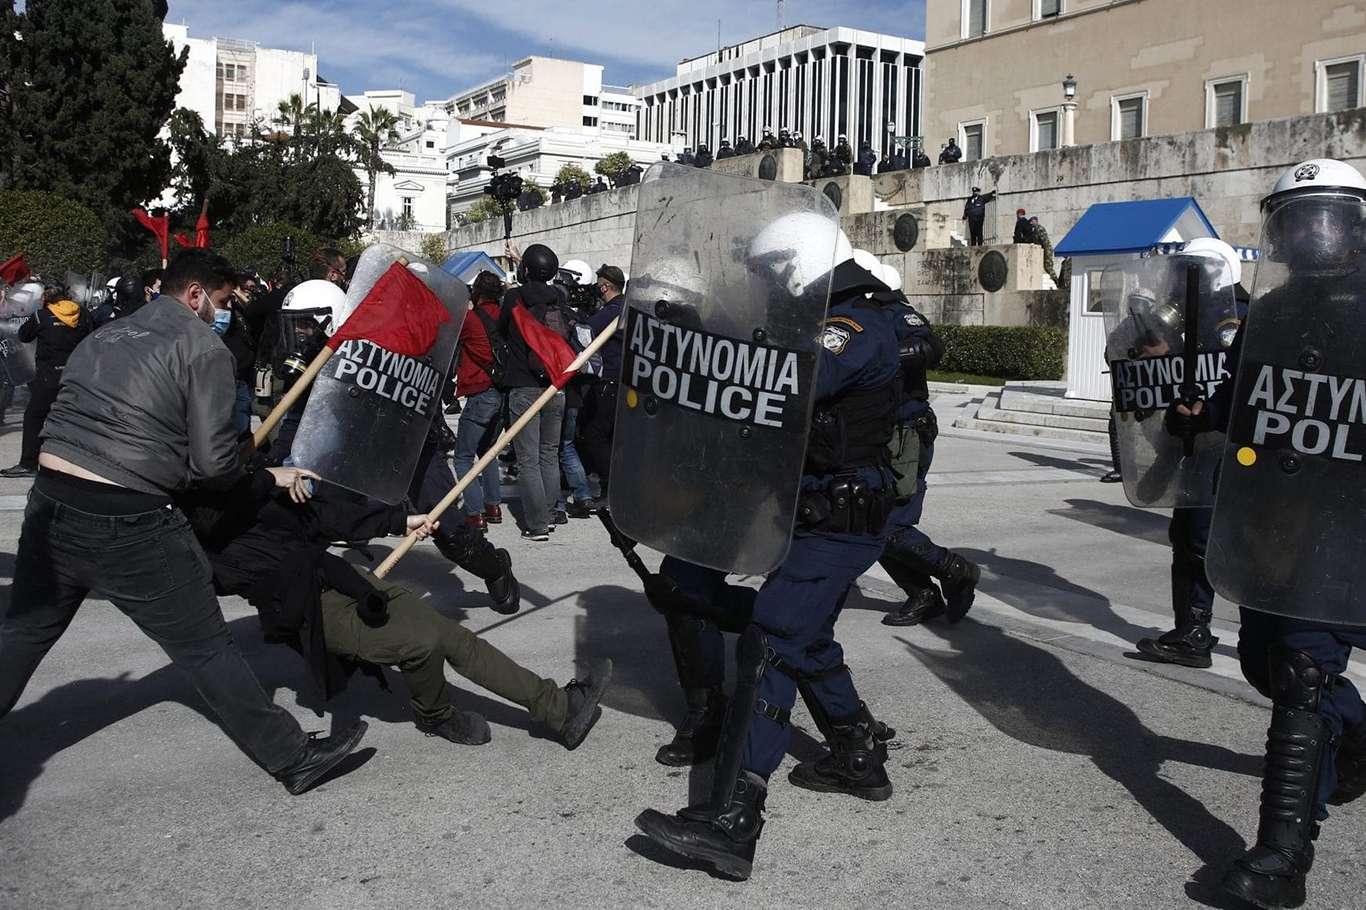 Yunanistan'da Öğrenciler Sokağa İndi